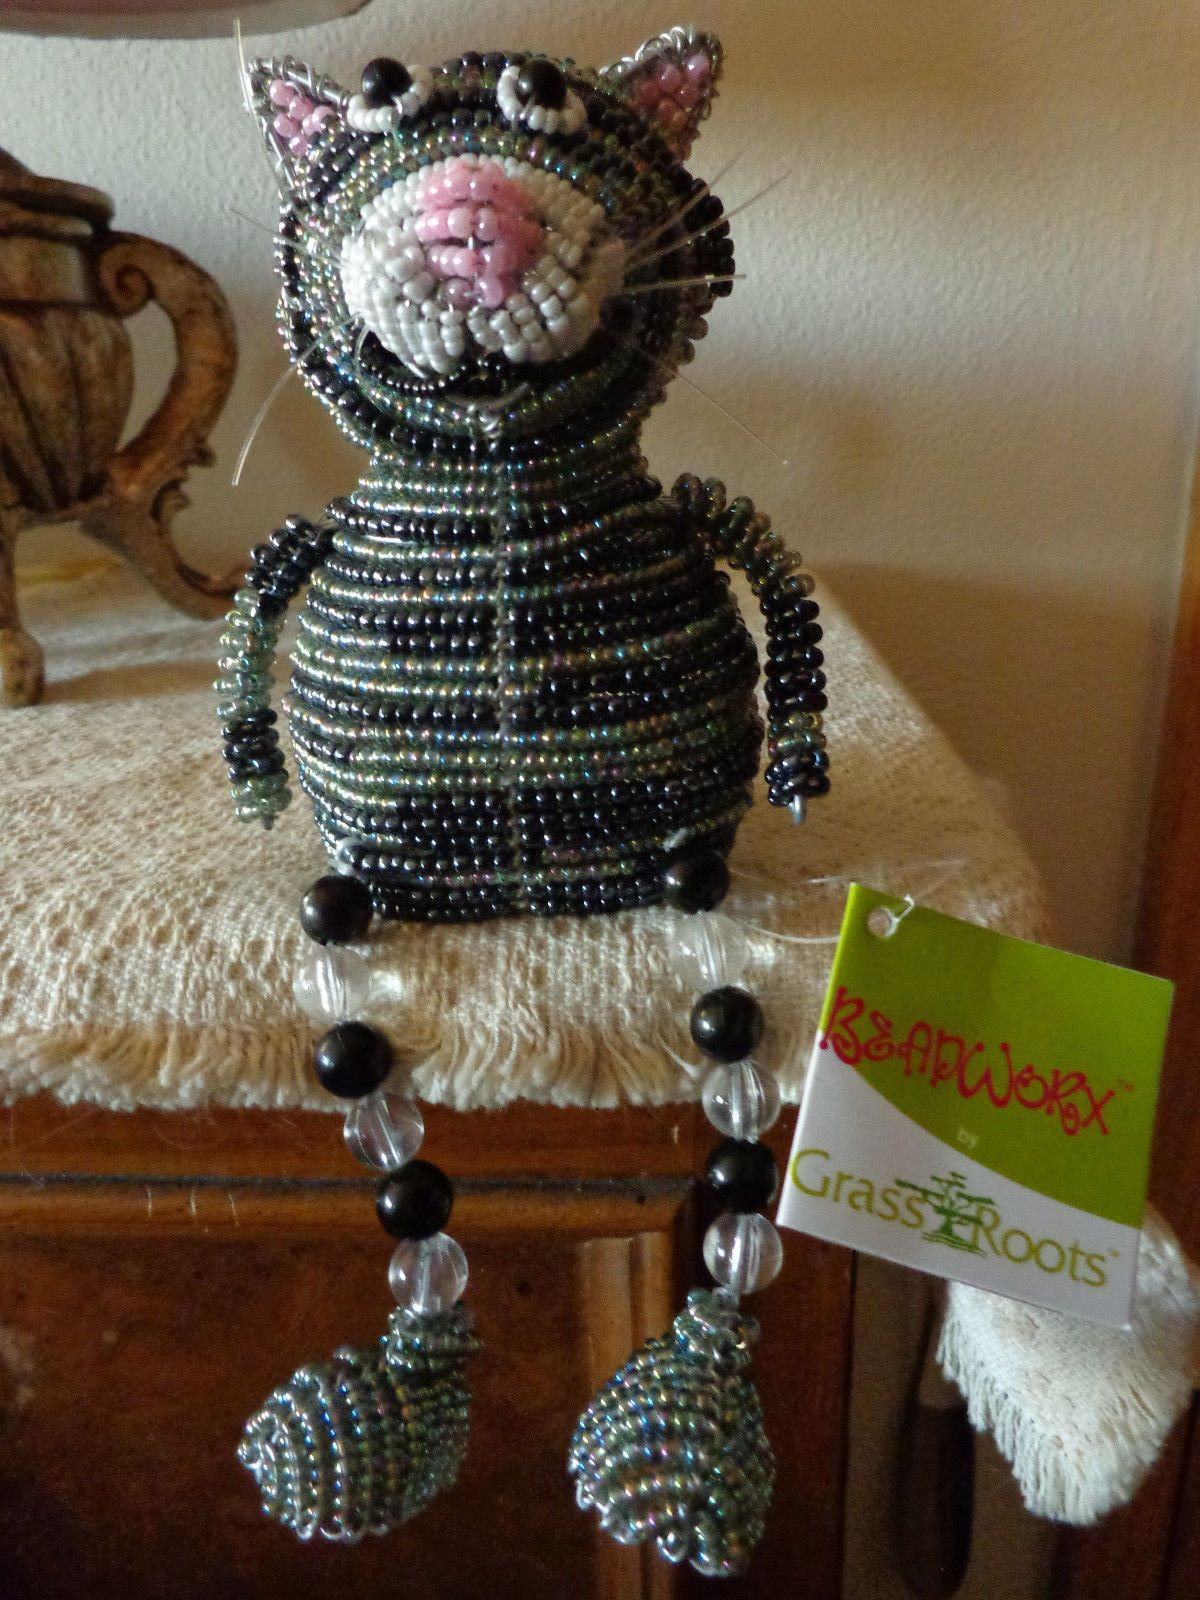 Beadworx Glass Beads Beaded Wire Cat, Artisan Sculpture